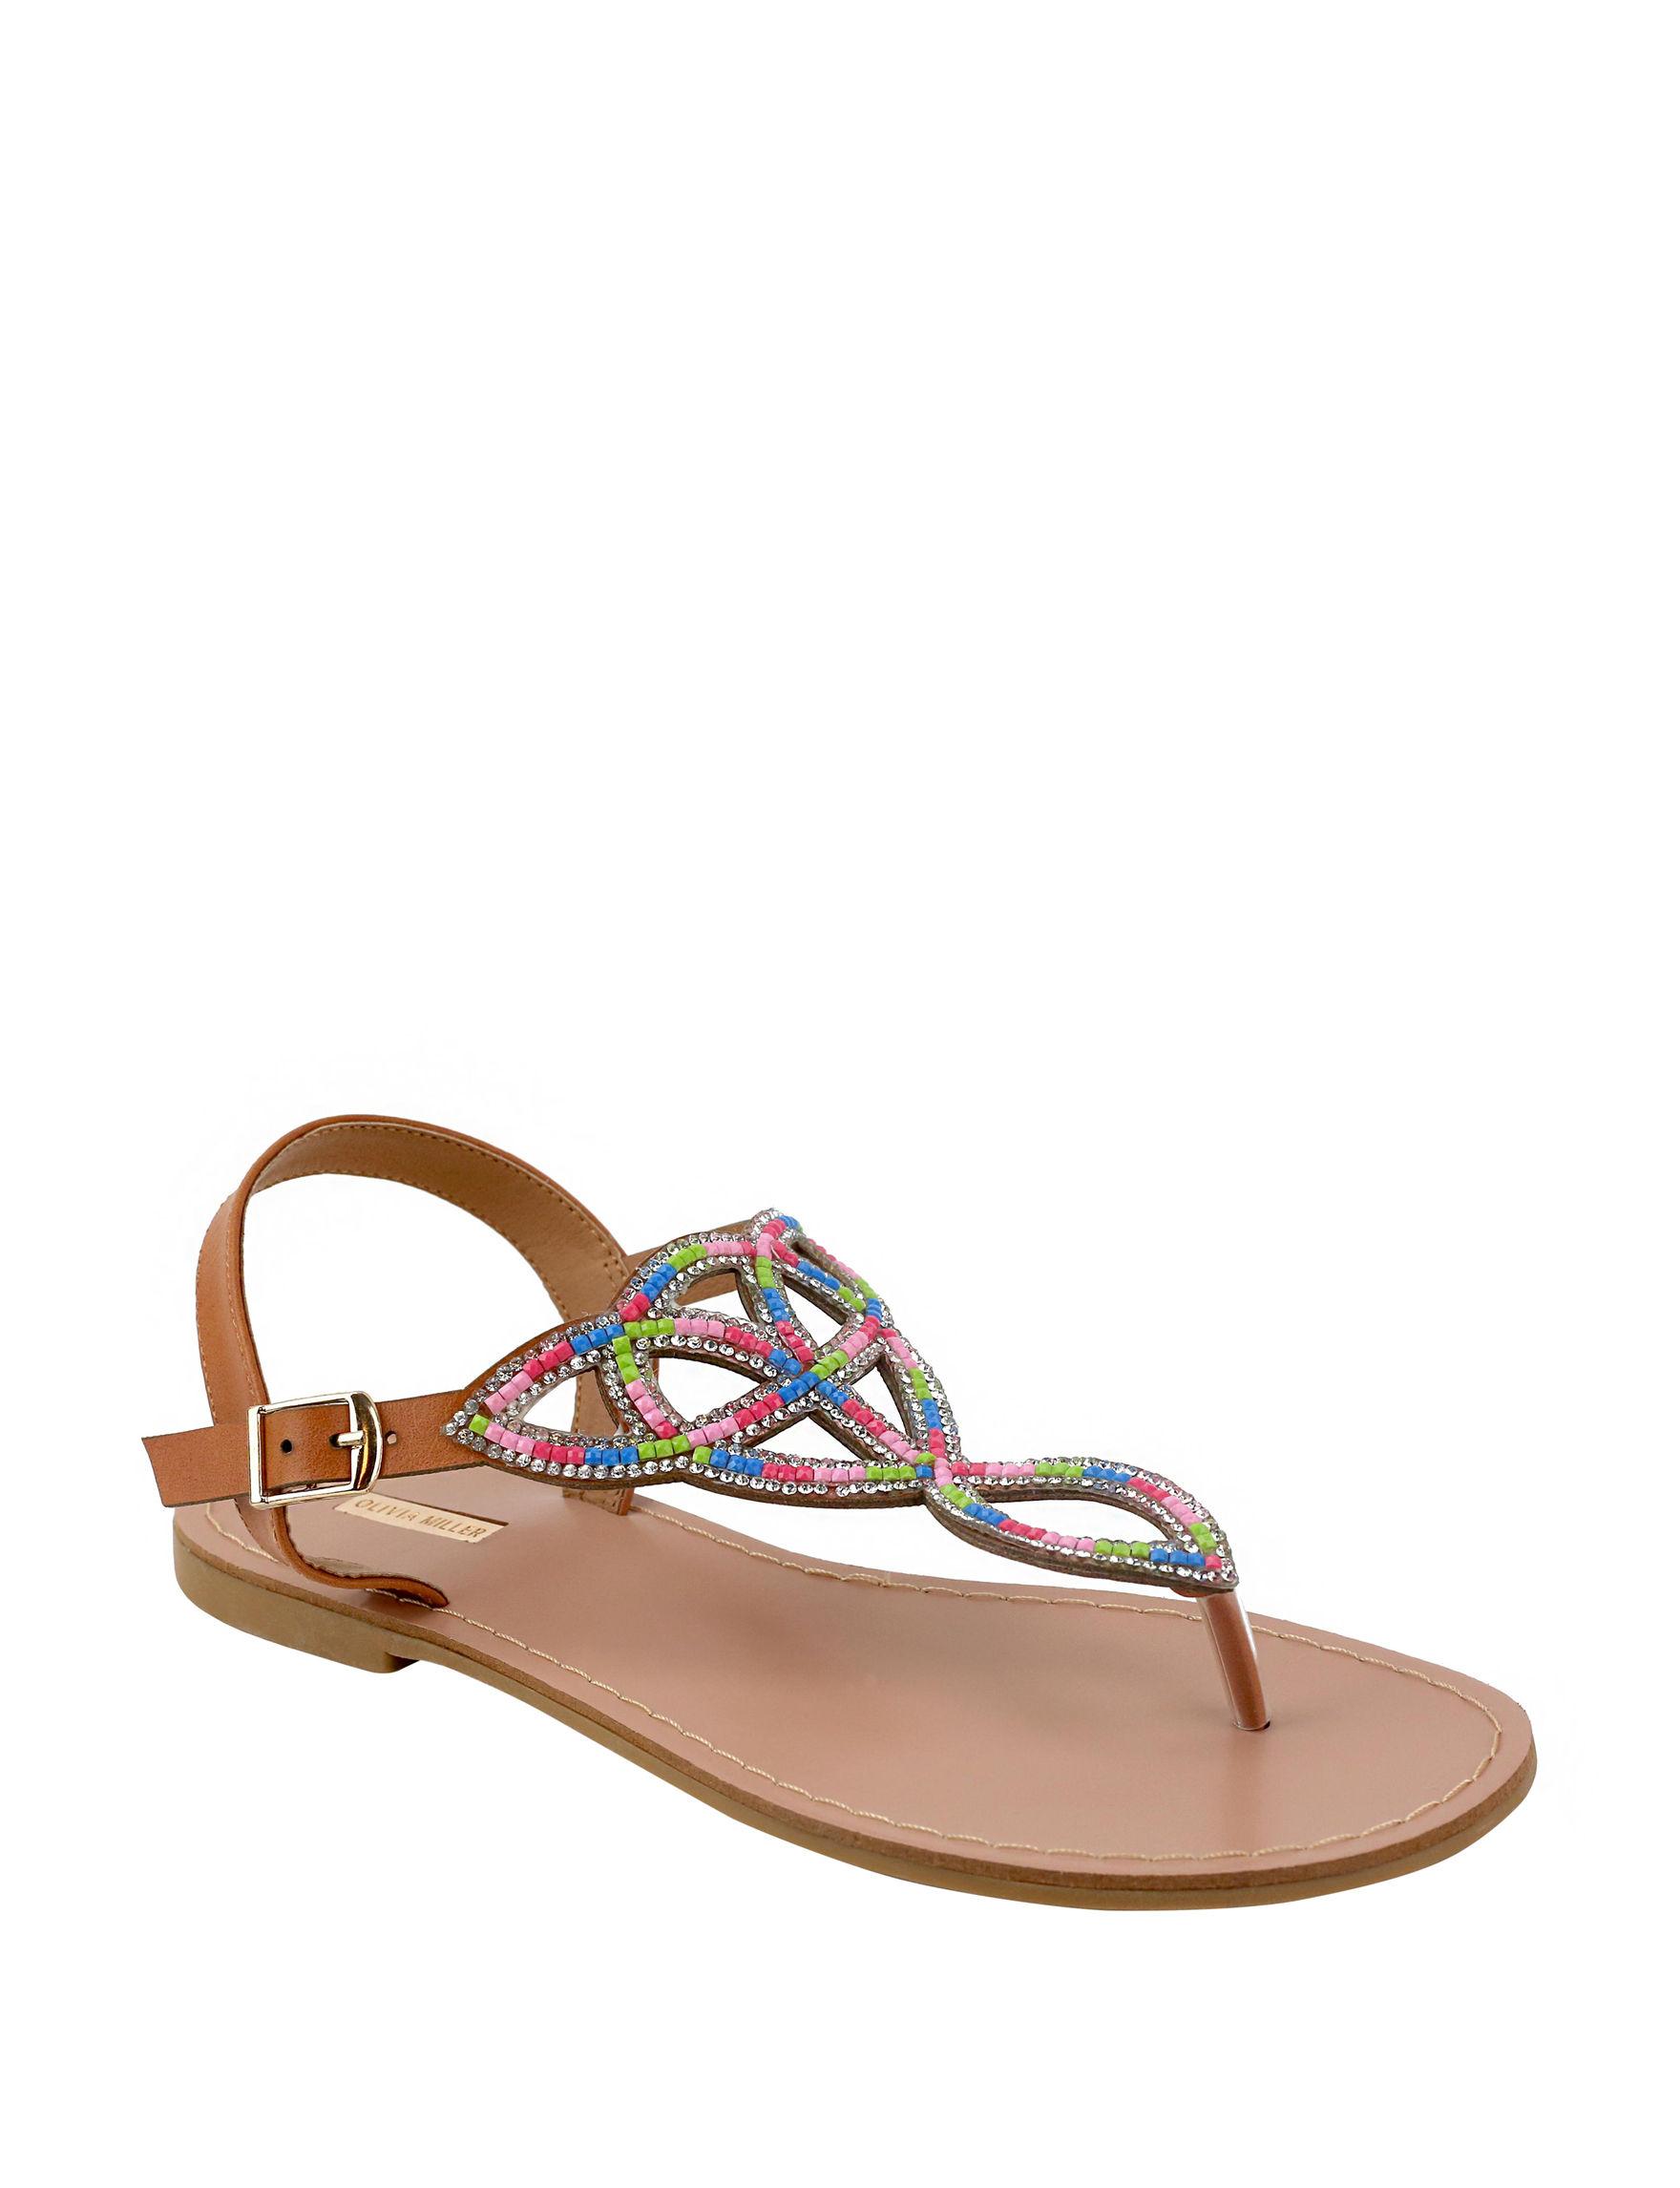 Olivia Miller Black Multi Flat Sandals